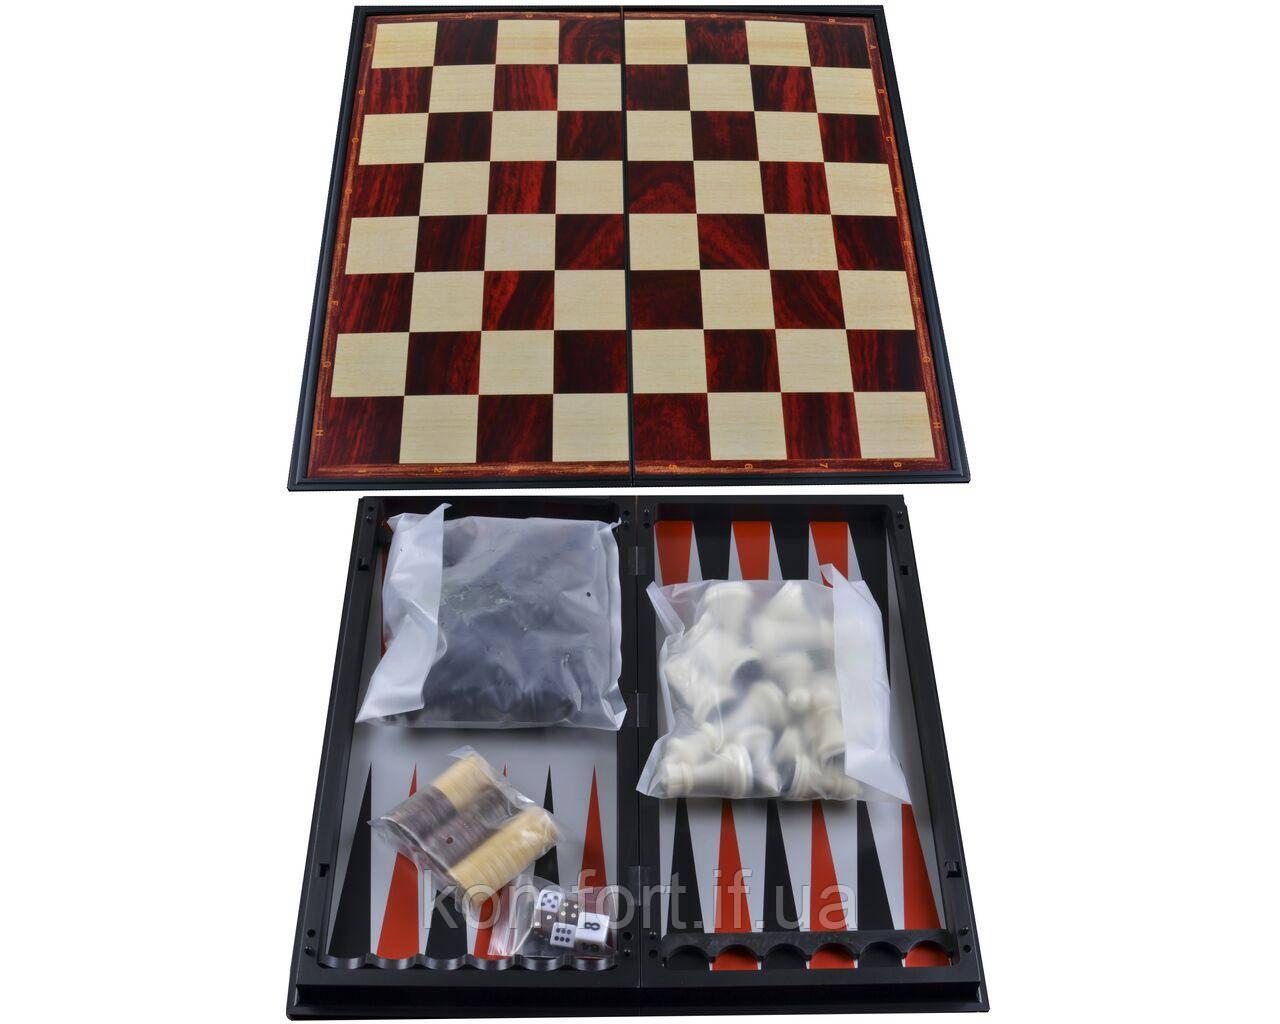 Набор 3в1 №37710 Нарды,Шахматы,Шашки 25х25 см (Магнитная доска)